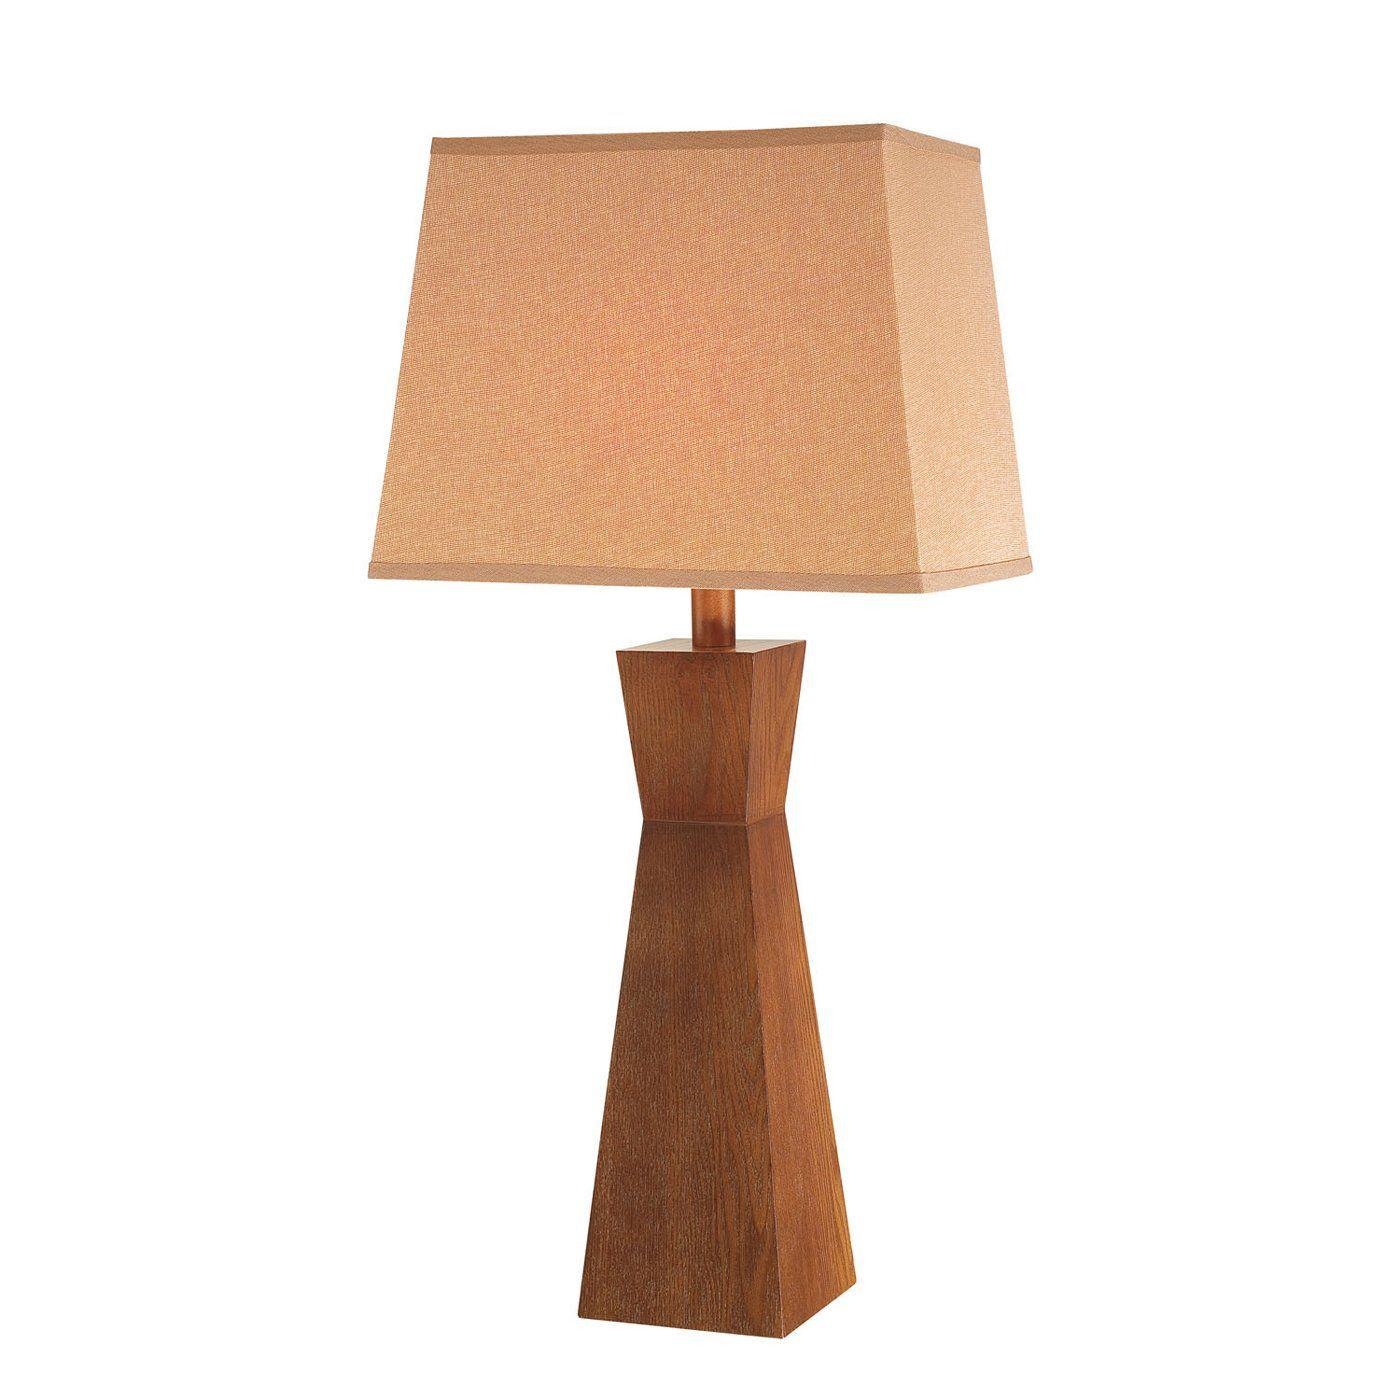 Lite Source LS21386 Table Lamp, Tan Lighting Universe